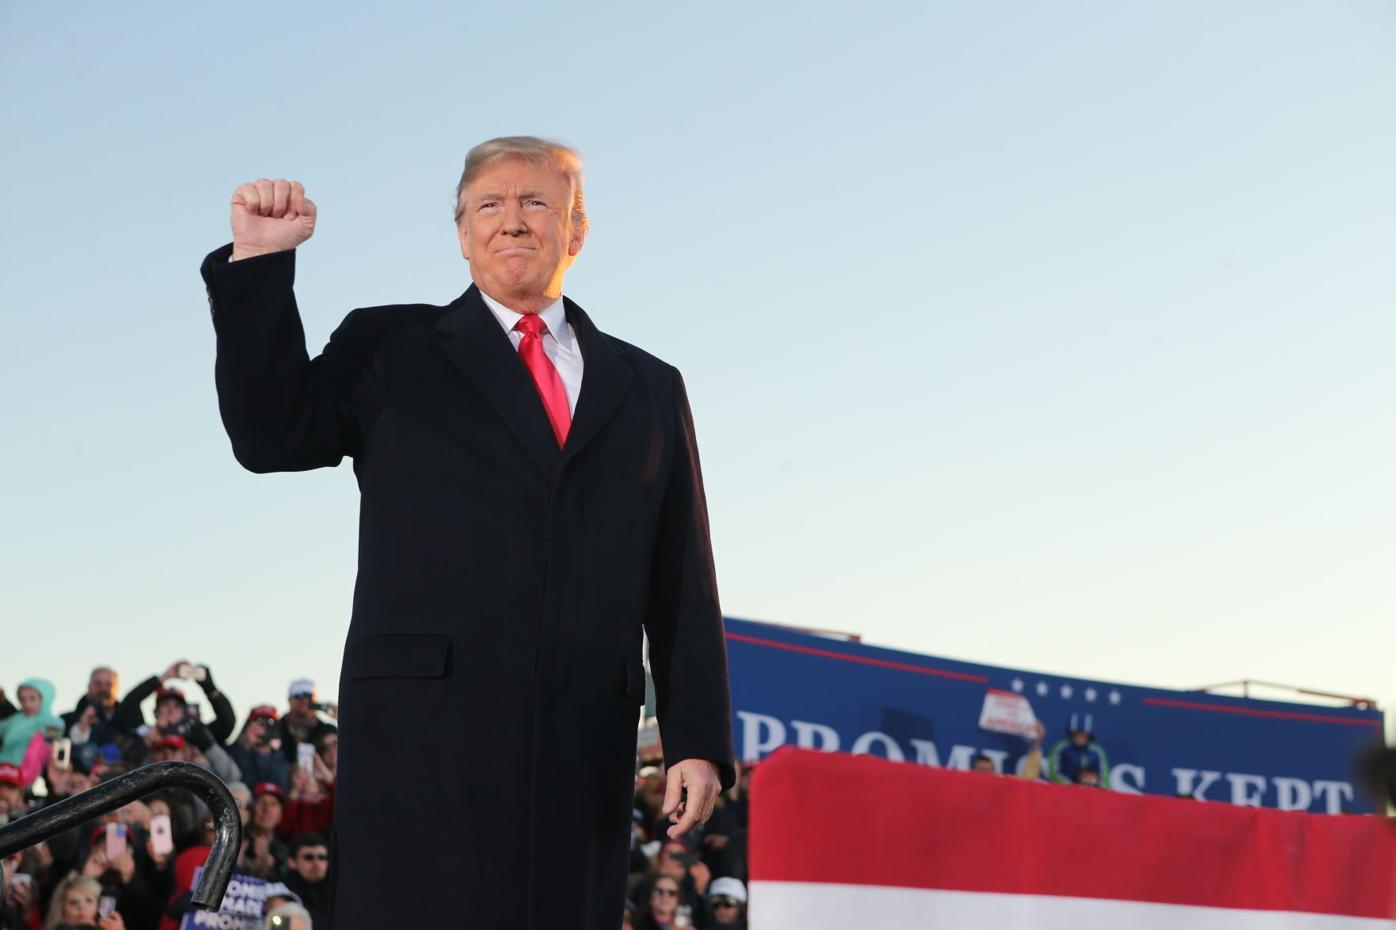 djr-2019-10-27-news-trump-implicationp1